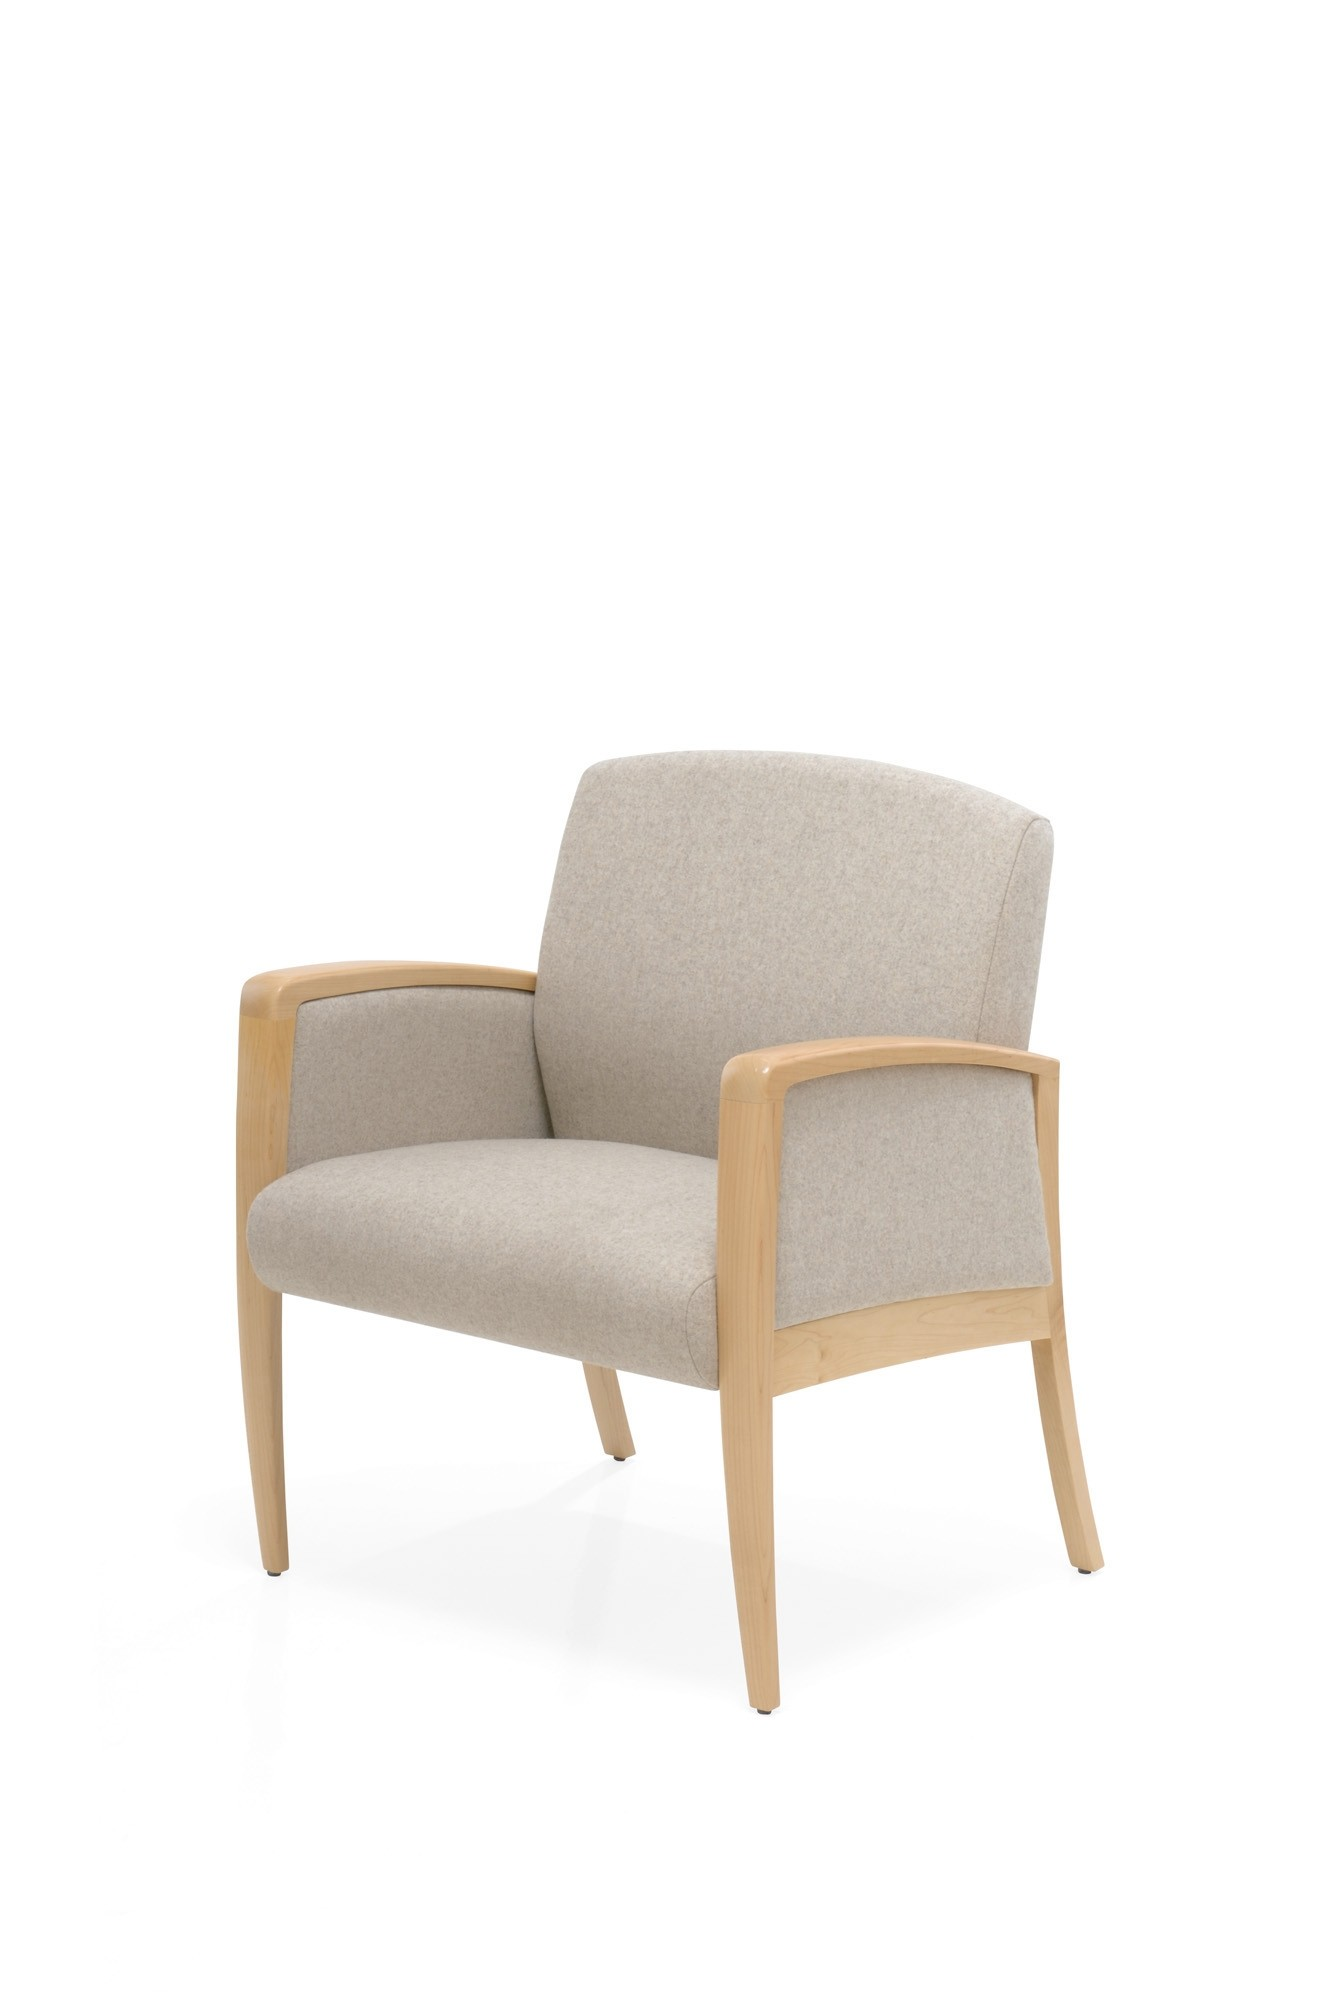 Krug Jordan chair  sc 1 st  Medical Resources & krug_jordan_chair